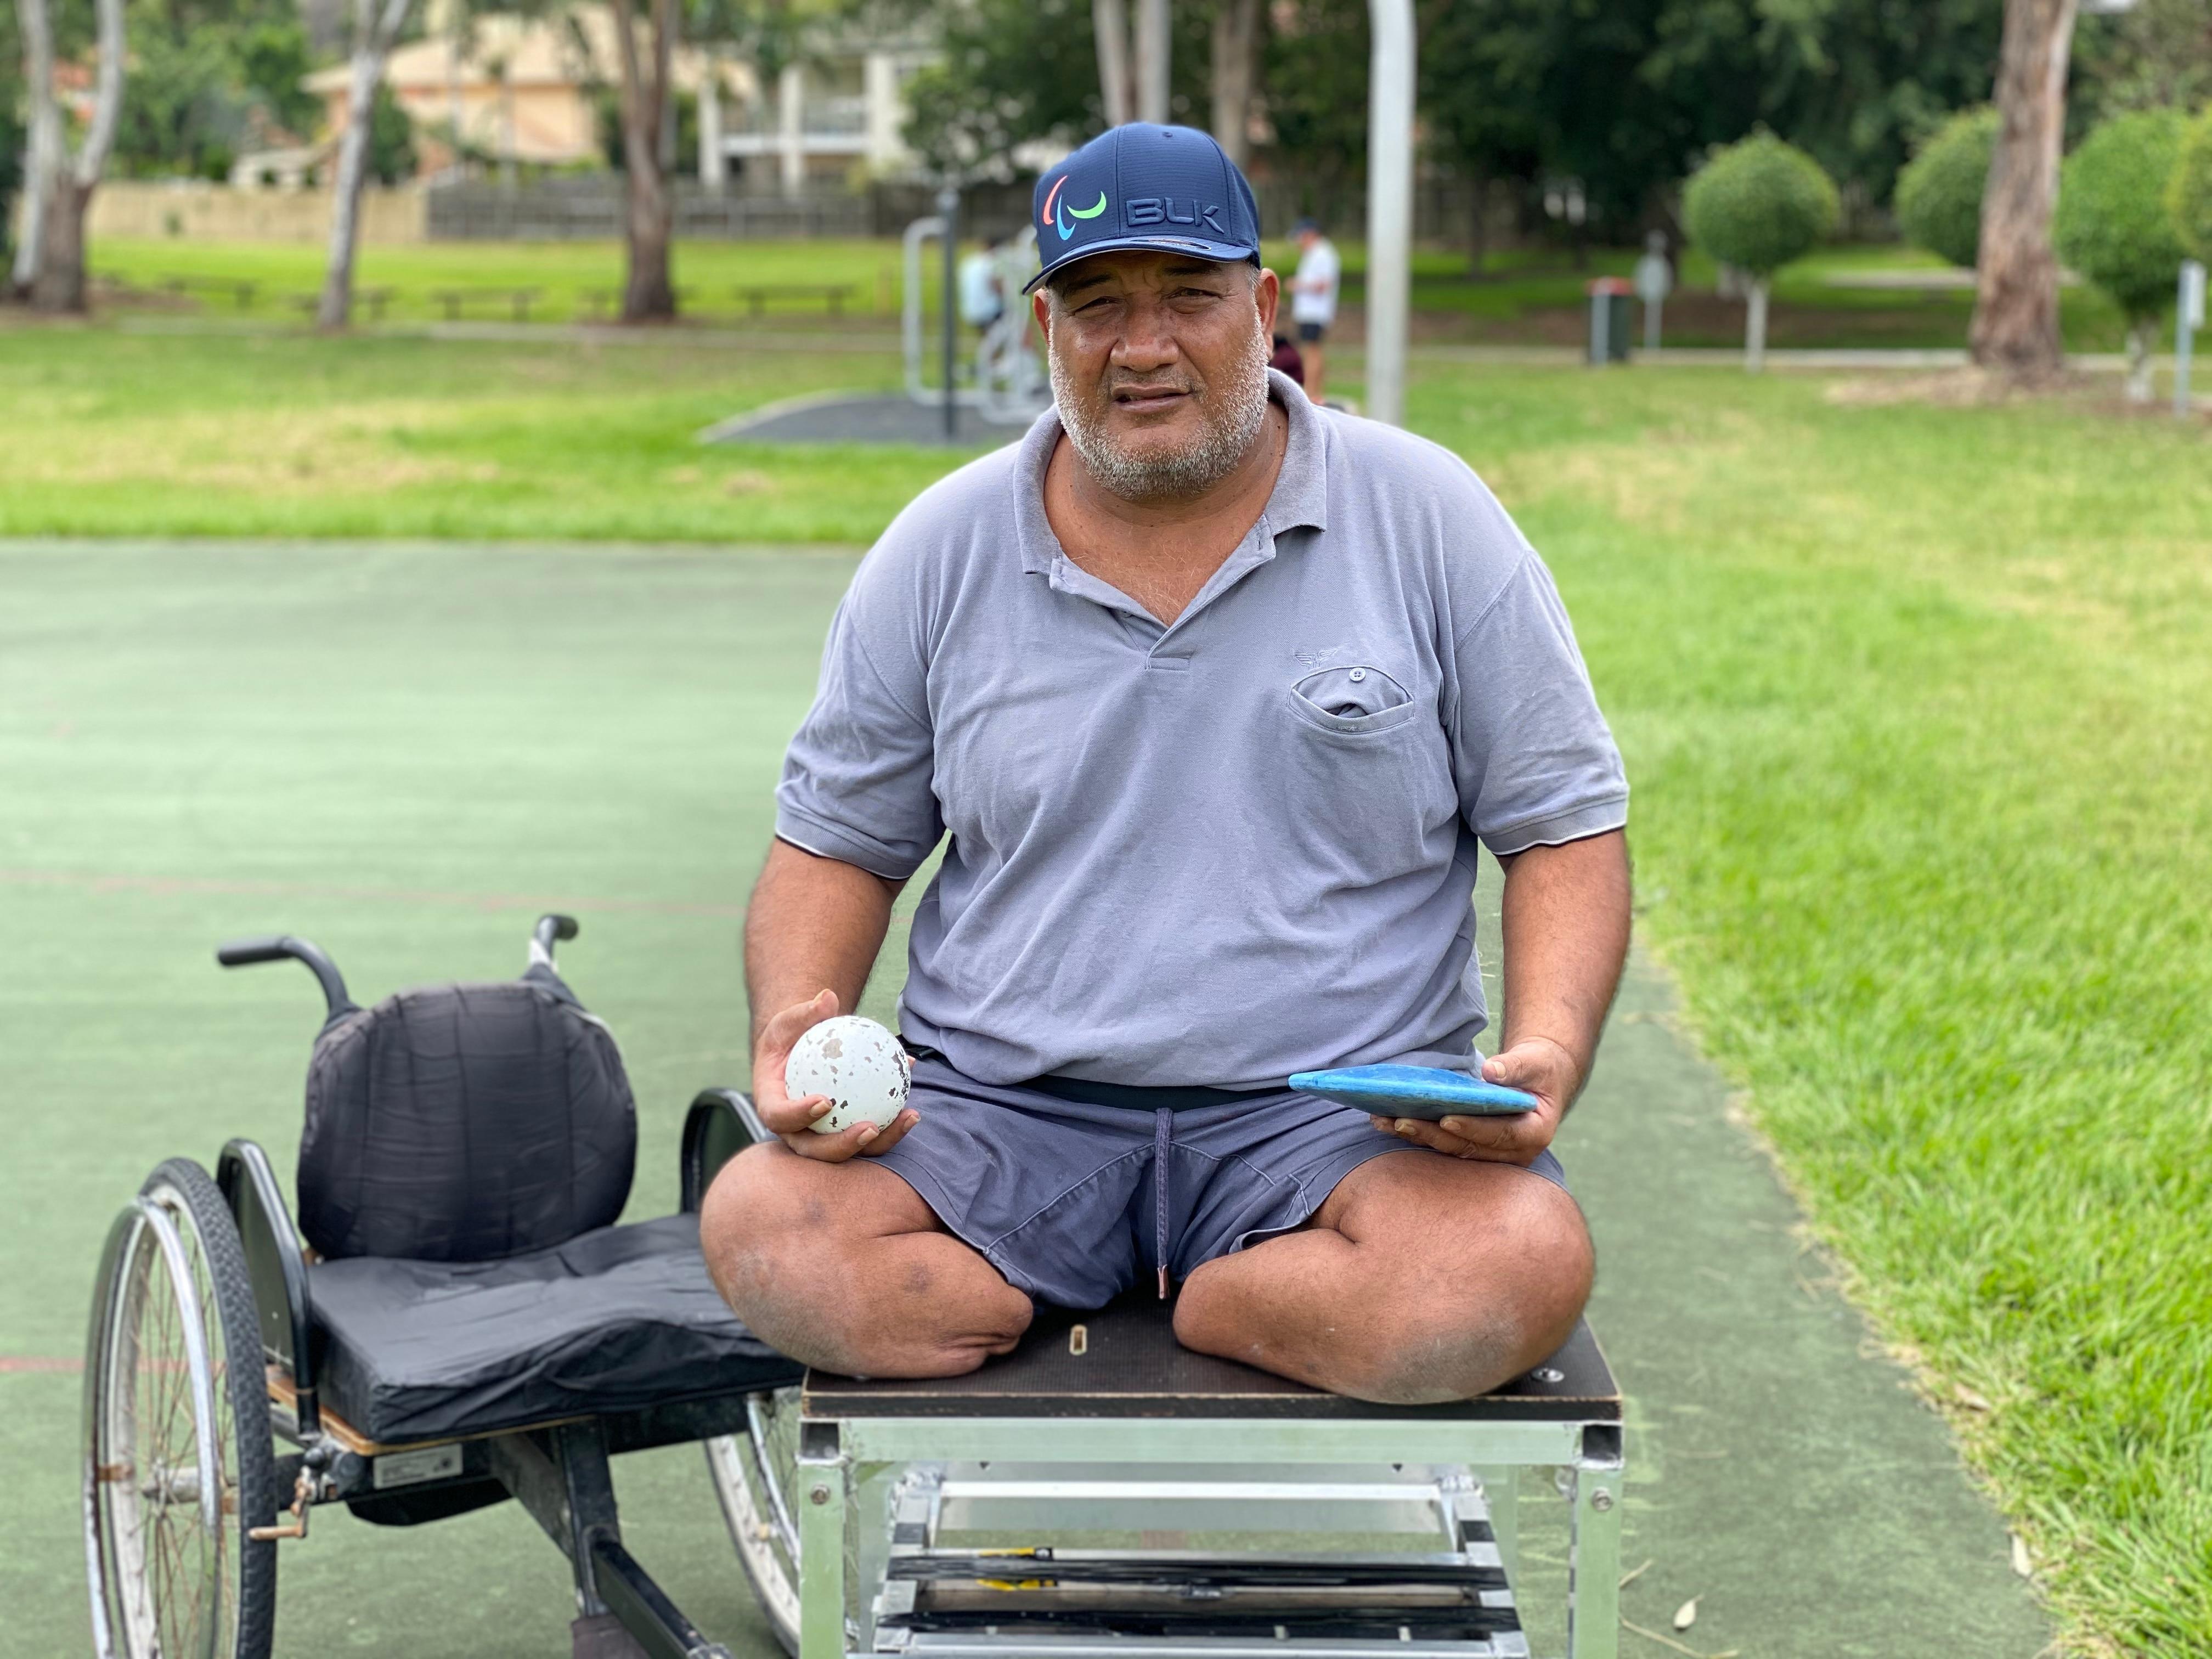 Karea Tioti is set to be Kiribati's first Paralympian.